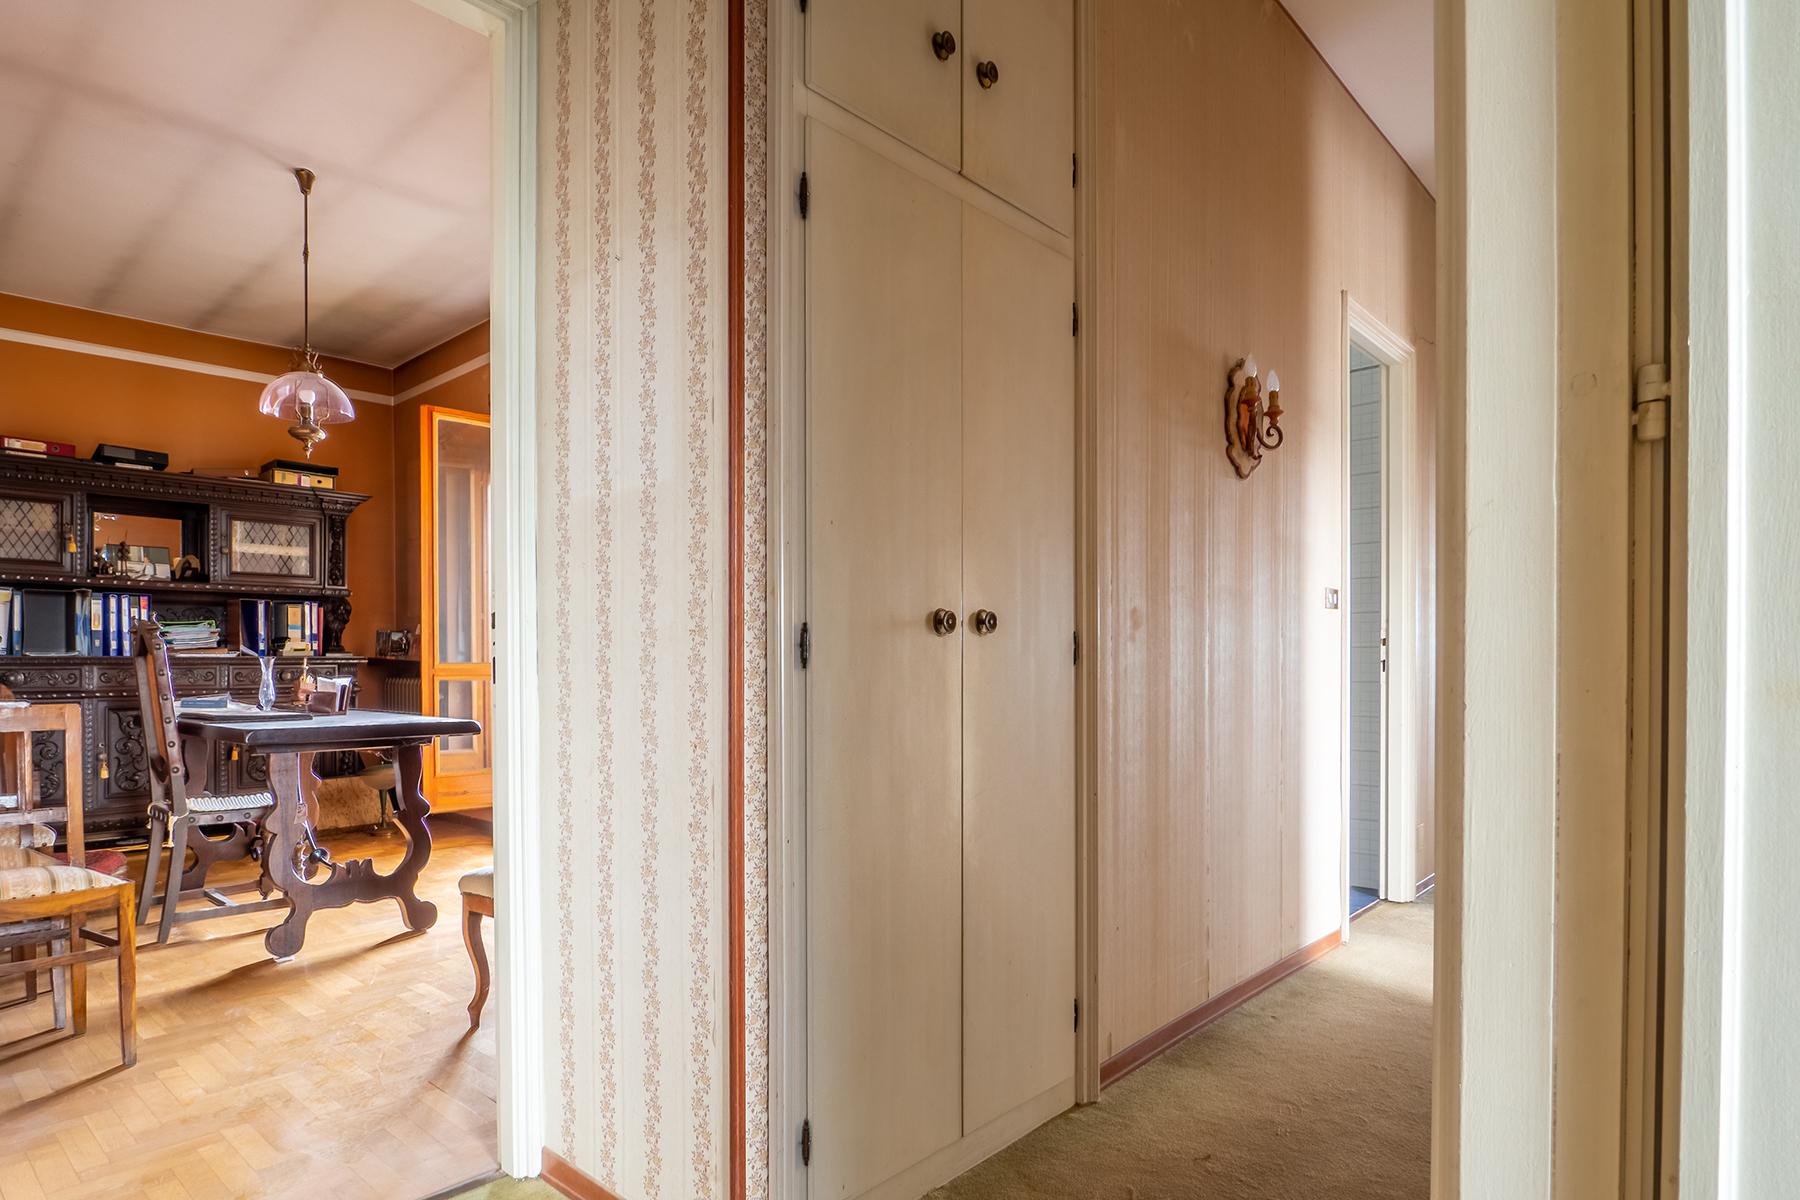 Casa indipendente in Vendita a Torino: 5 locali, 277 mq - Foto 19